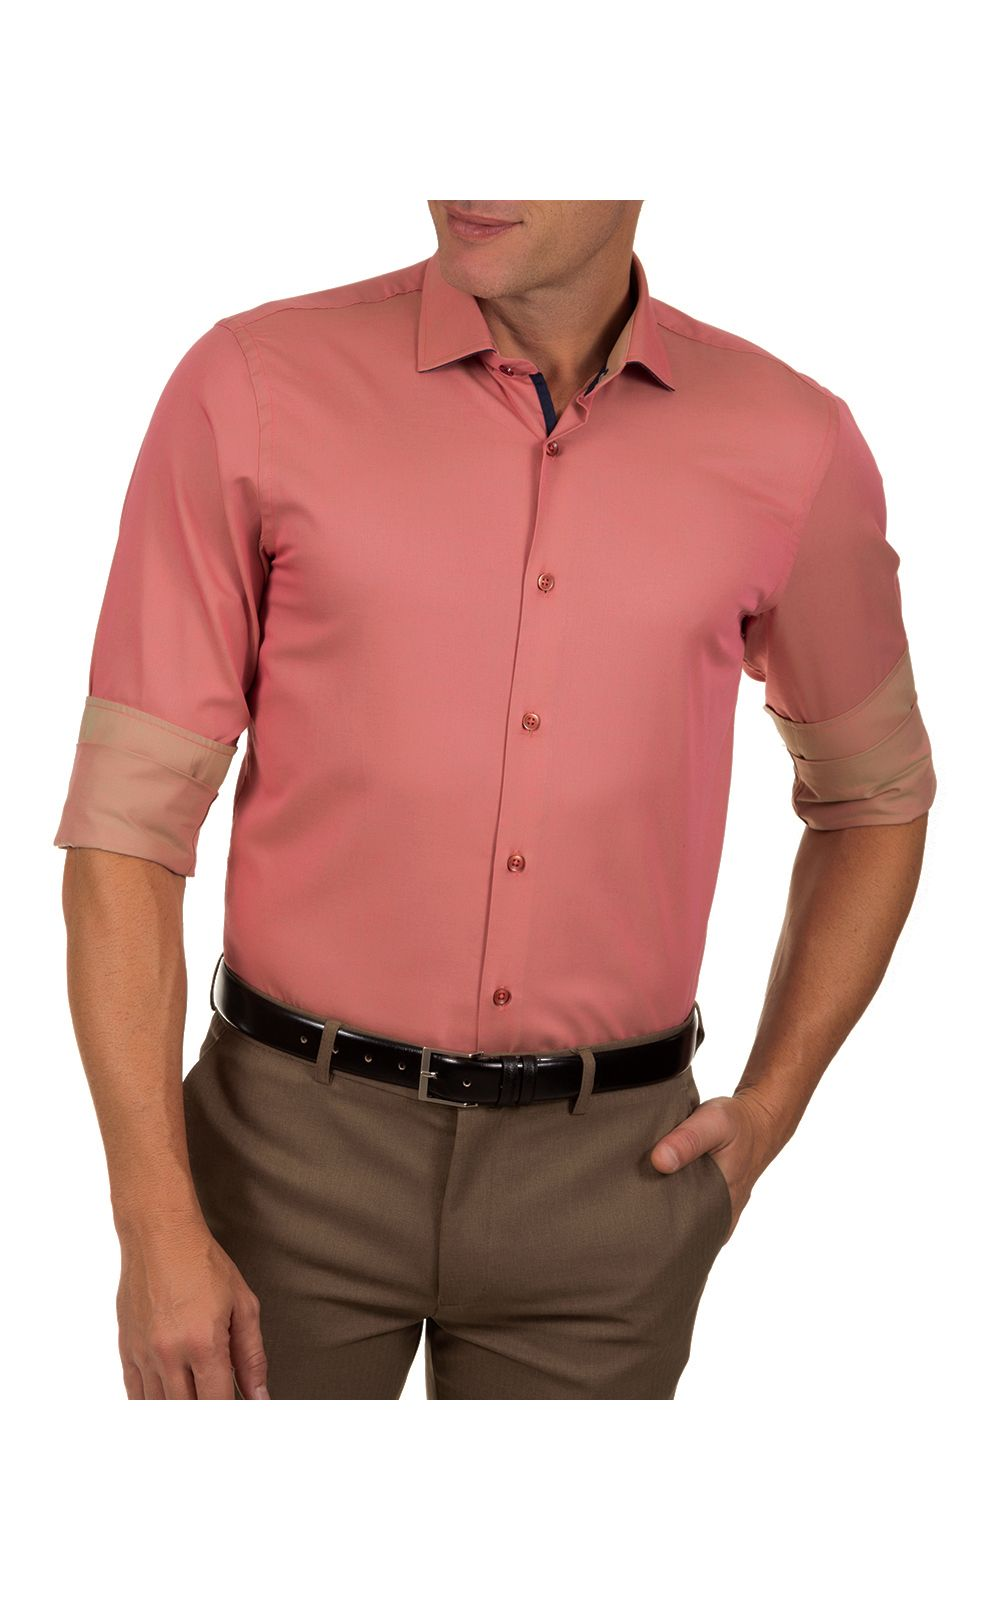 Foto 1 - Camisa Social Masculina Vermelho Lisa